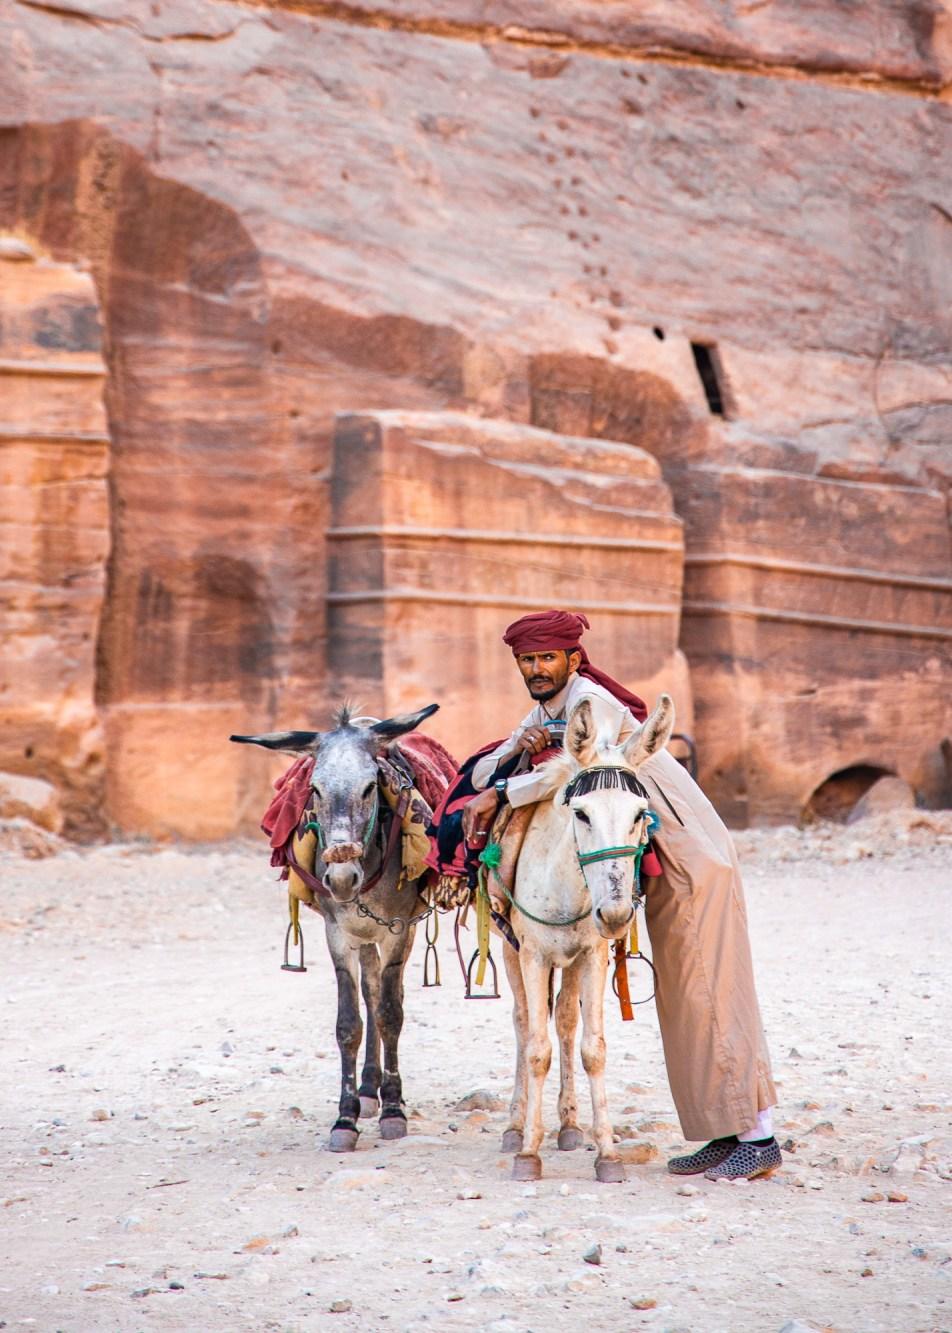 Bedouin and his donkey in Petra, Jordan